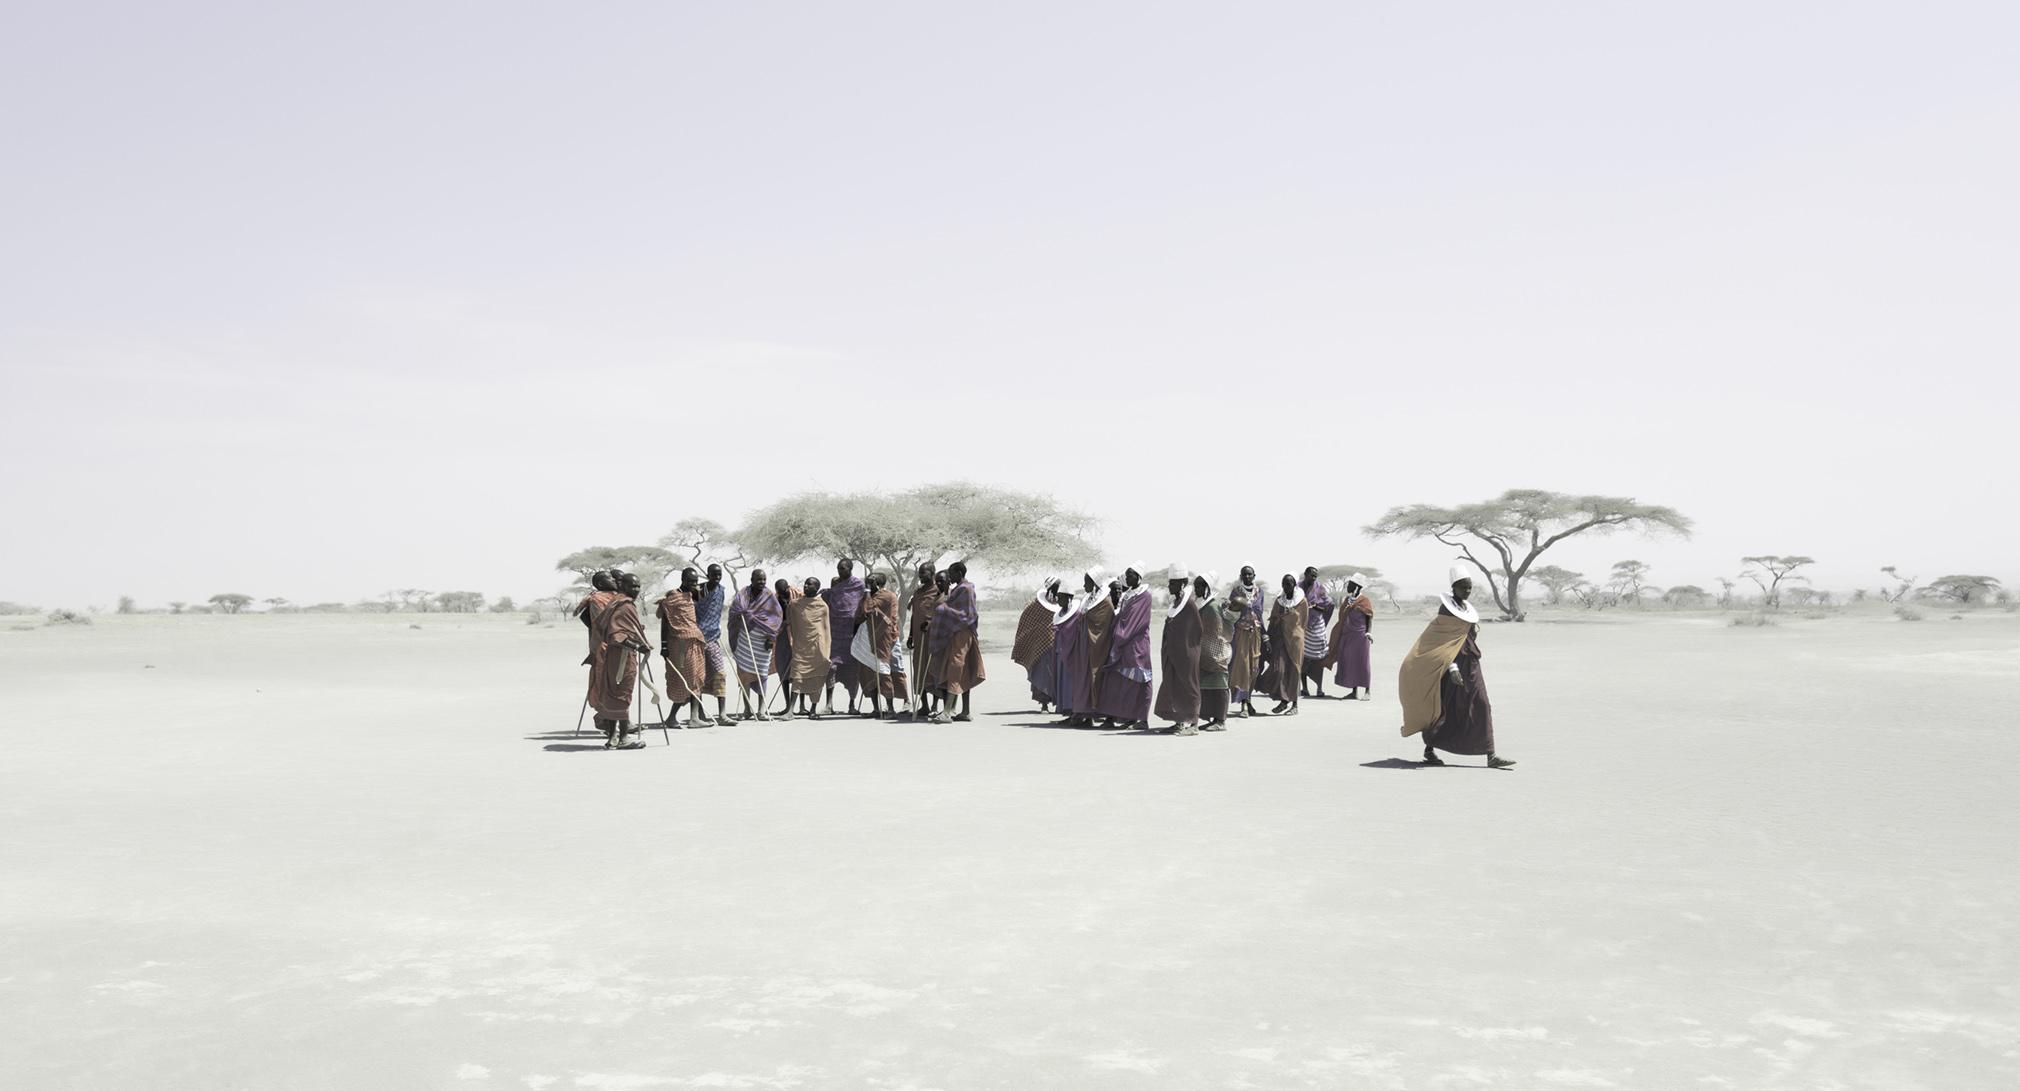 Serengeti Fashion Week (2015) - Miguel Ángel Gómez Sanz - Miguel Ángel Gómez